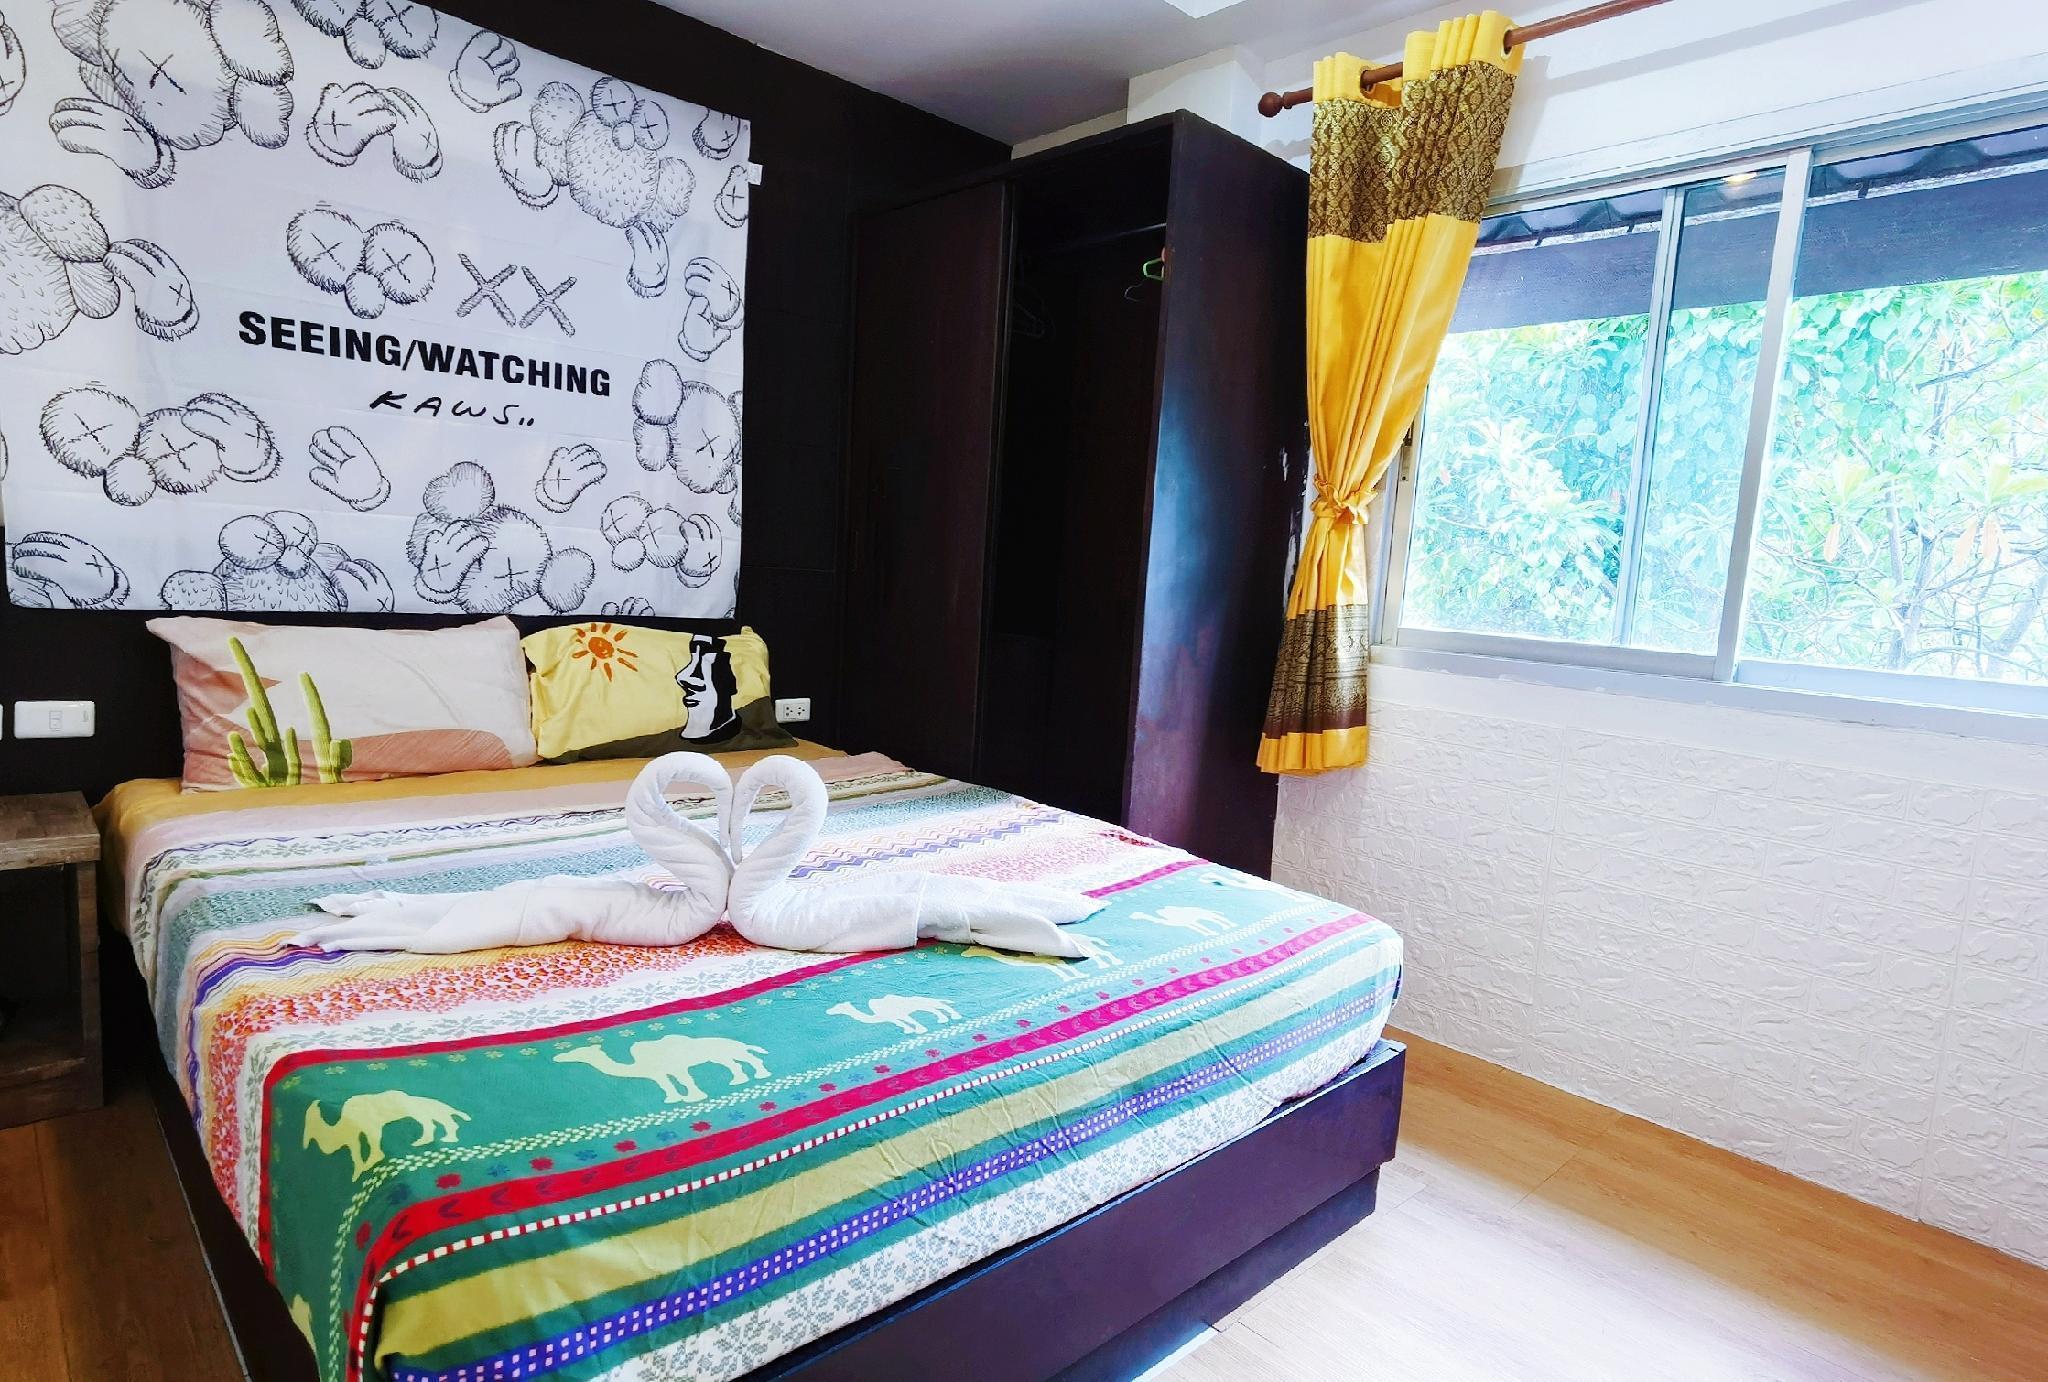 21Cheap Patong Beach Economy Room#Near Juncylon อพาร์ตเมนต์ 1 ห้องนอน 1 ห้องน้ำส่วนตัว ขนาด 22 ตร.ม. – ป่าตอง